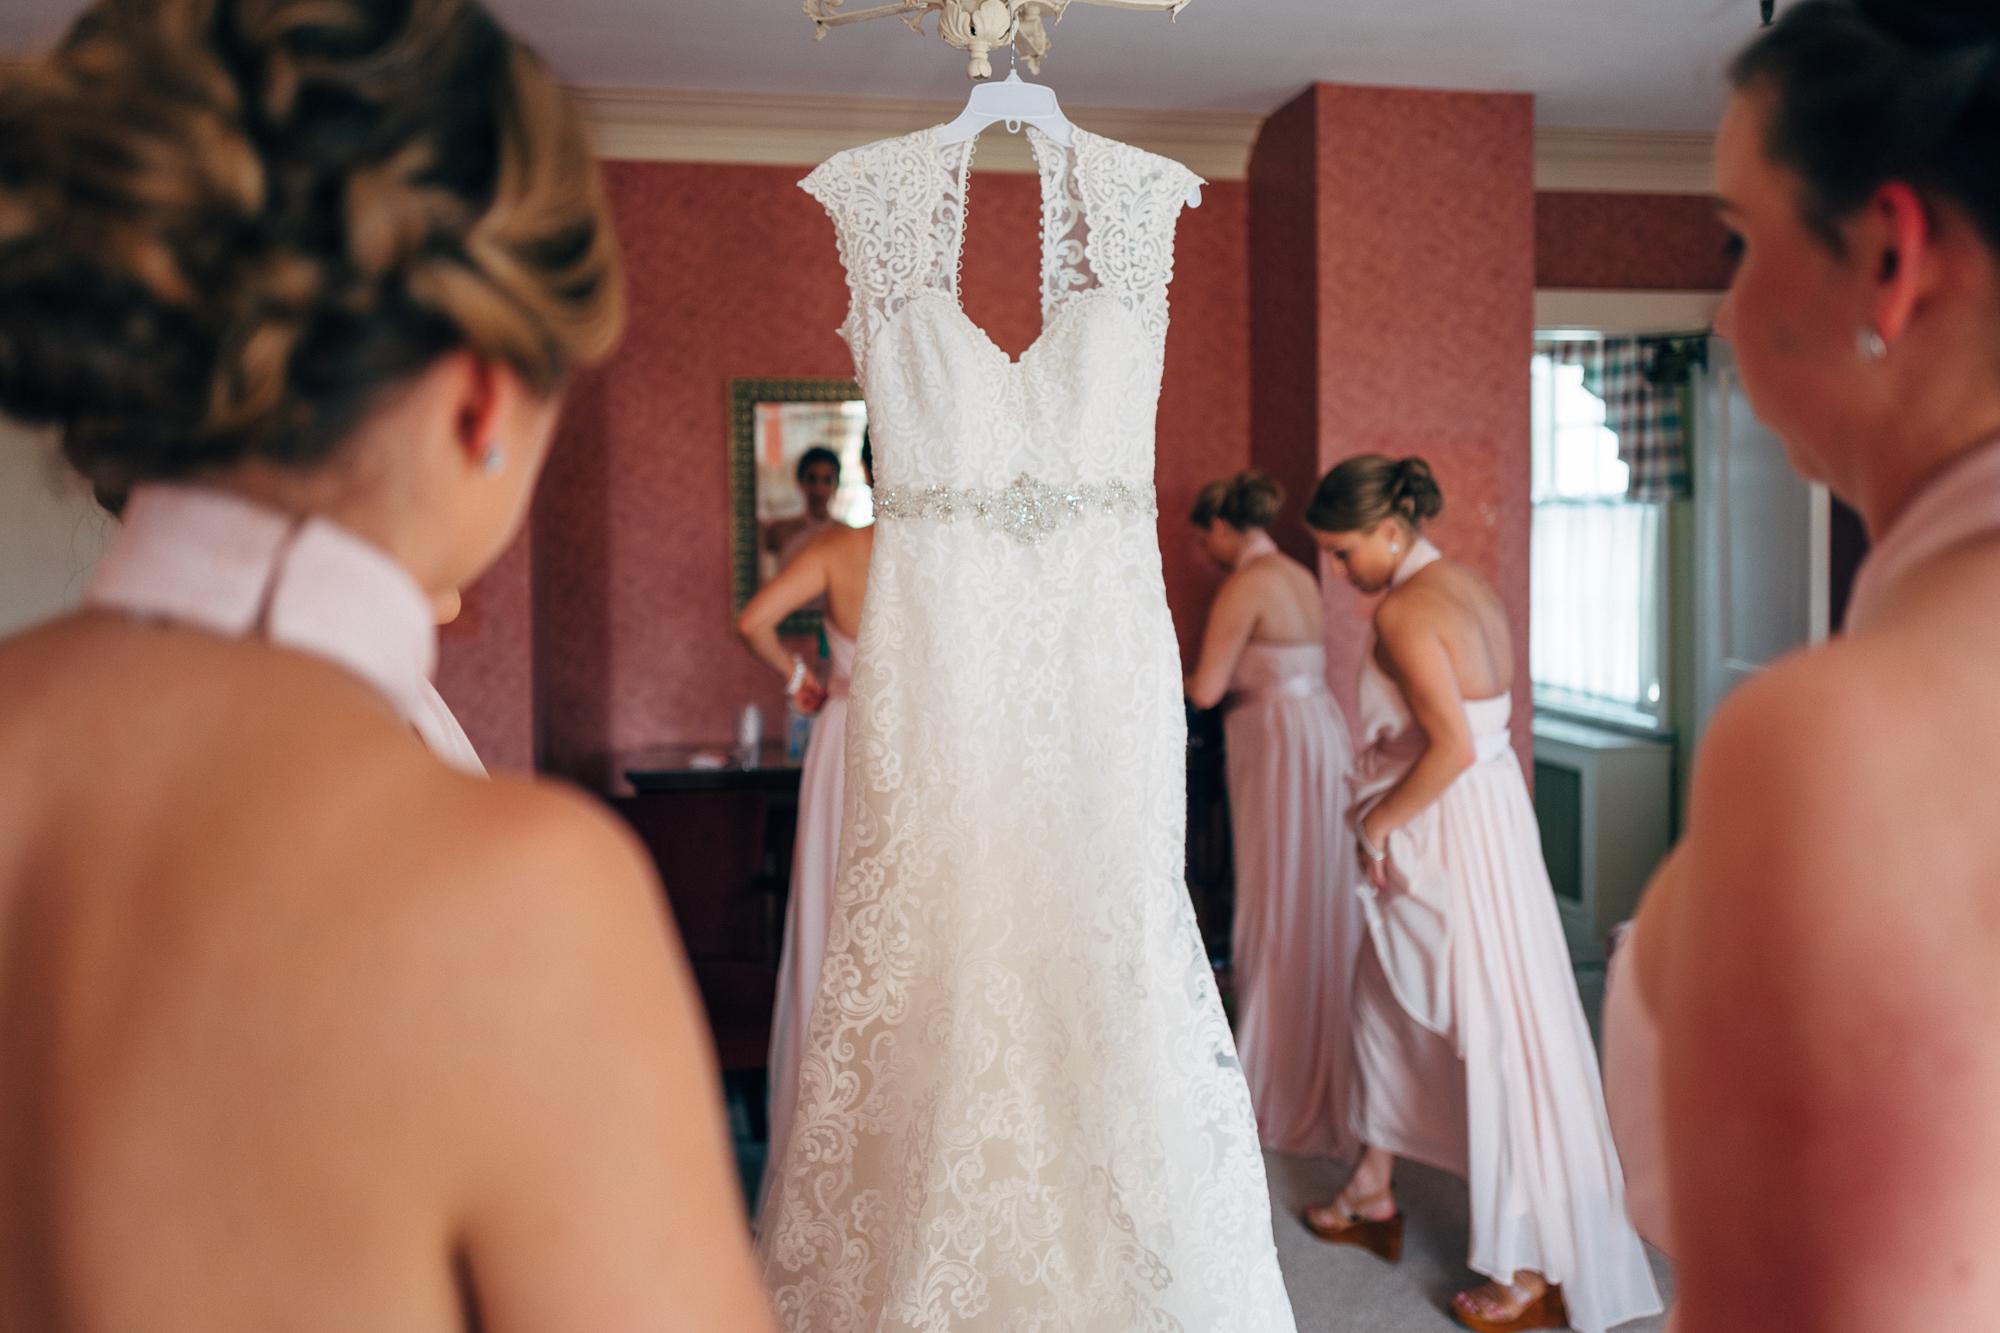 scranton-wedding-photography-zak-zavada-2016.06-rebeccaIan-0151.jpg